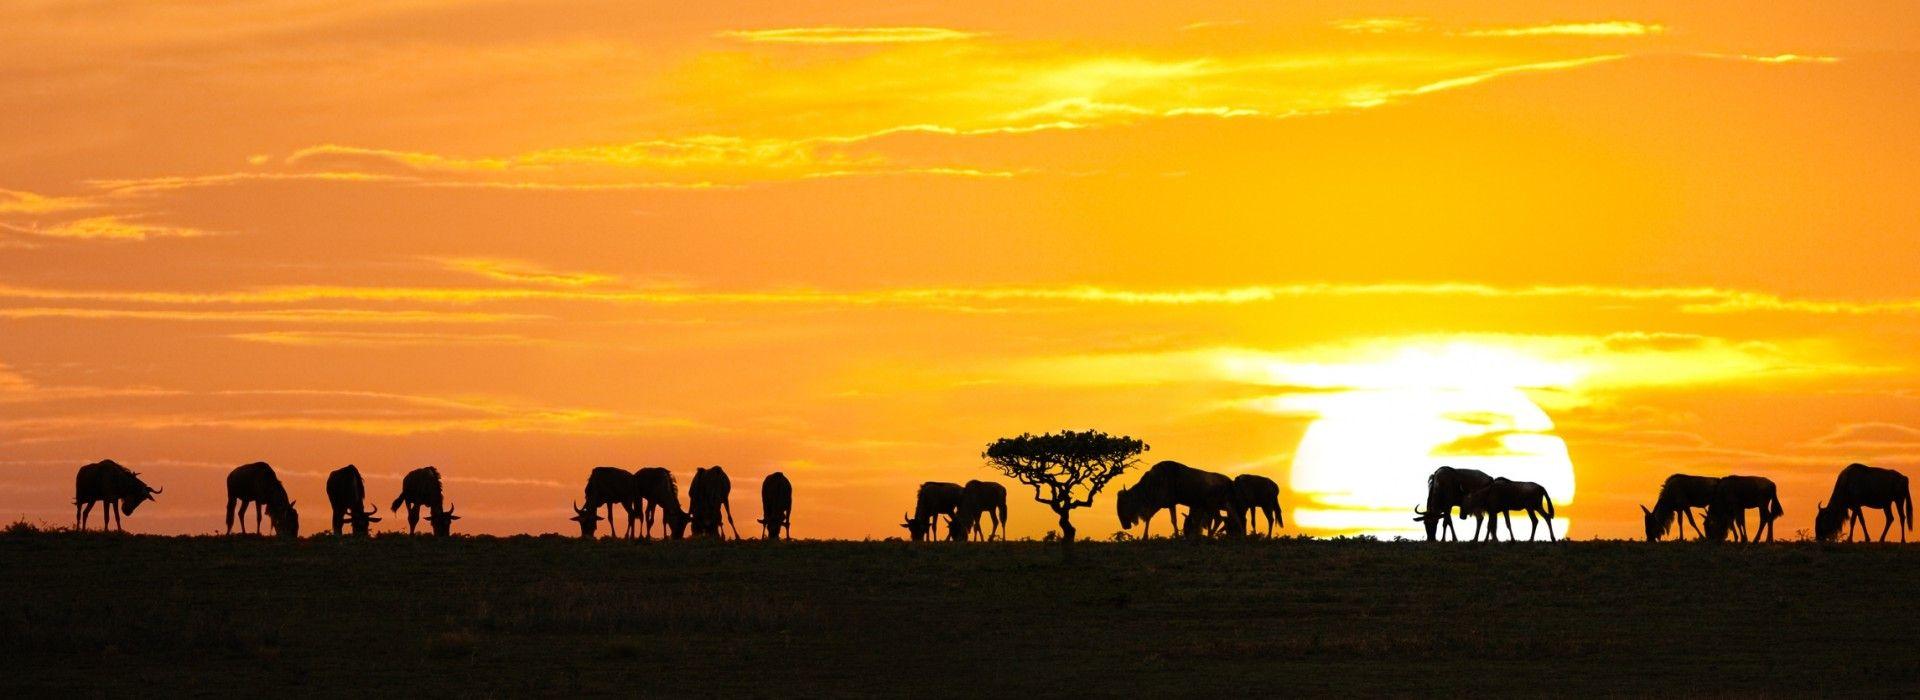 Wildlife safaris and game drives Tours in Kilimanjaro